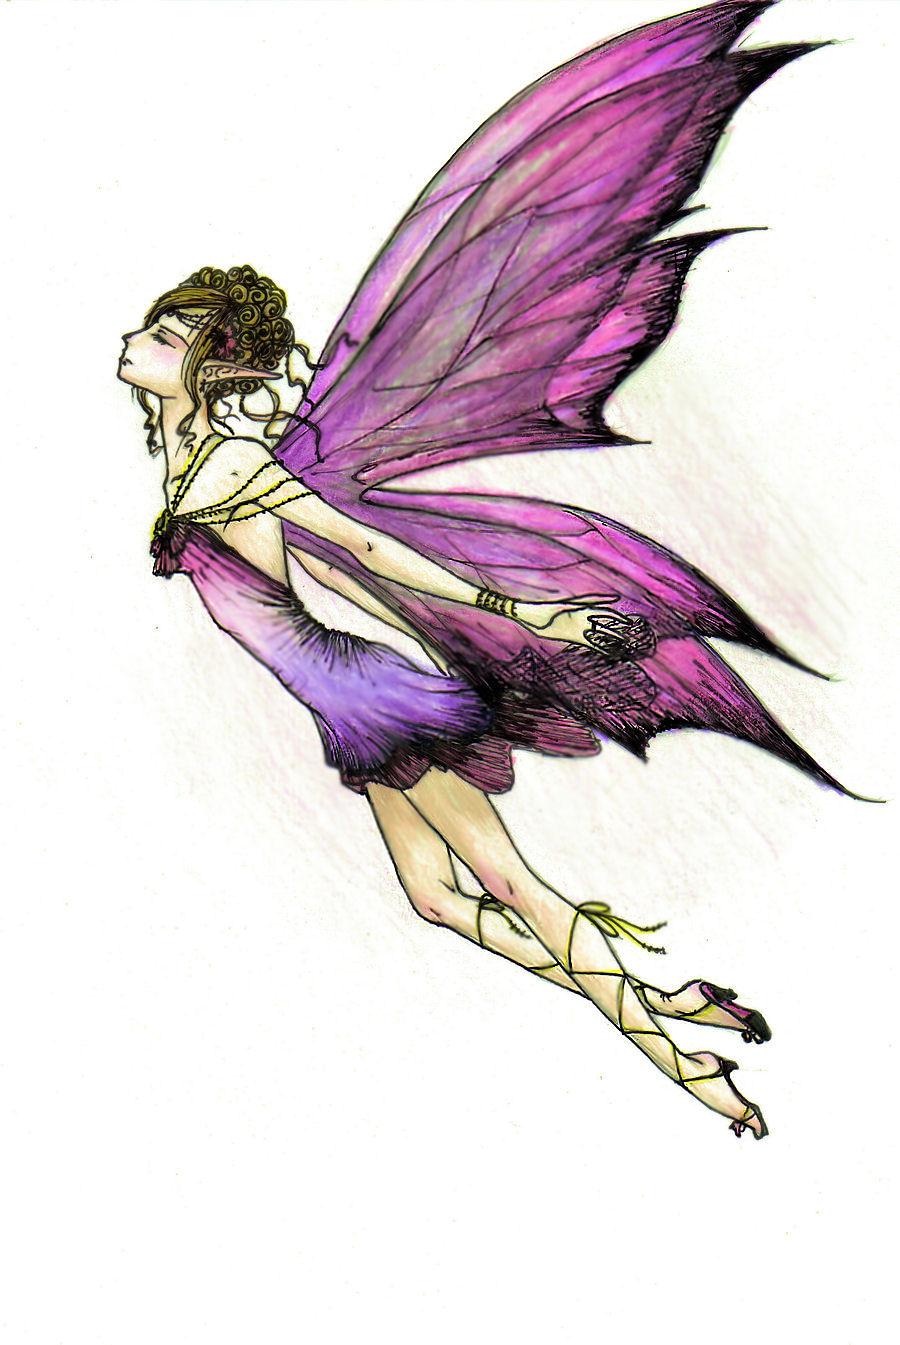 Fairy sketch Colored by animeghostygirl on DeviantArt